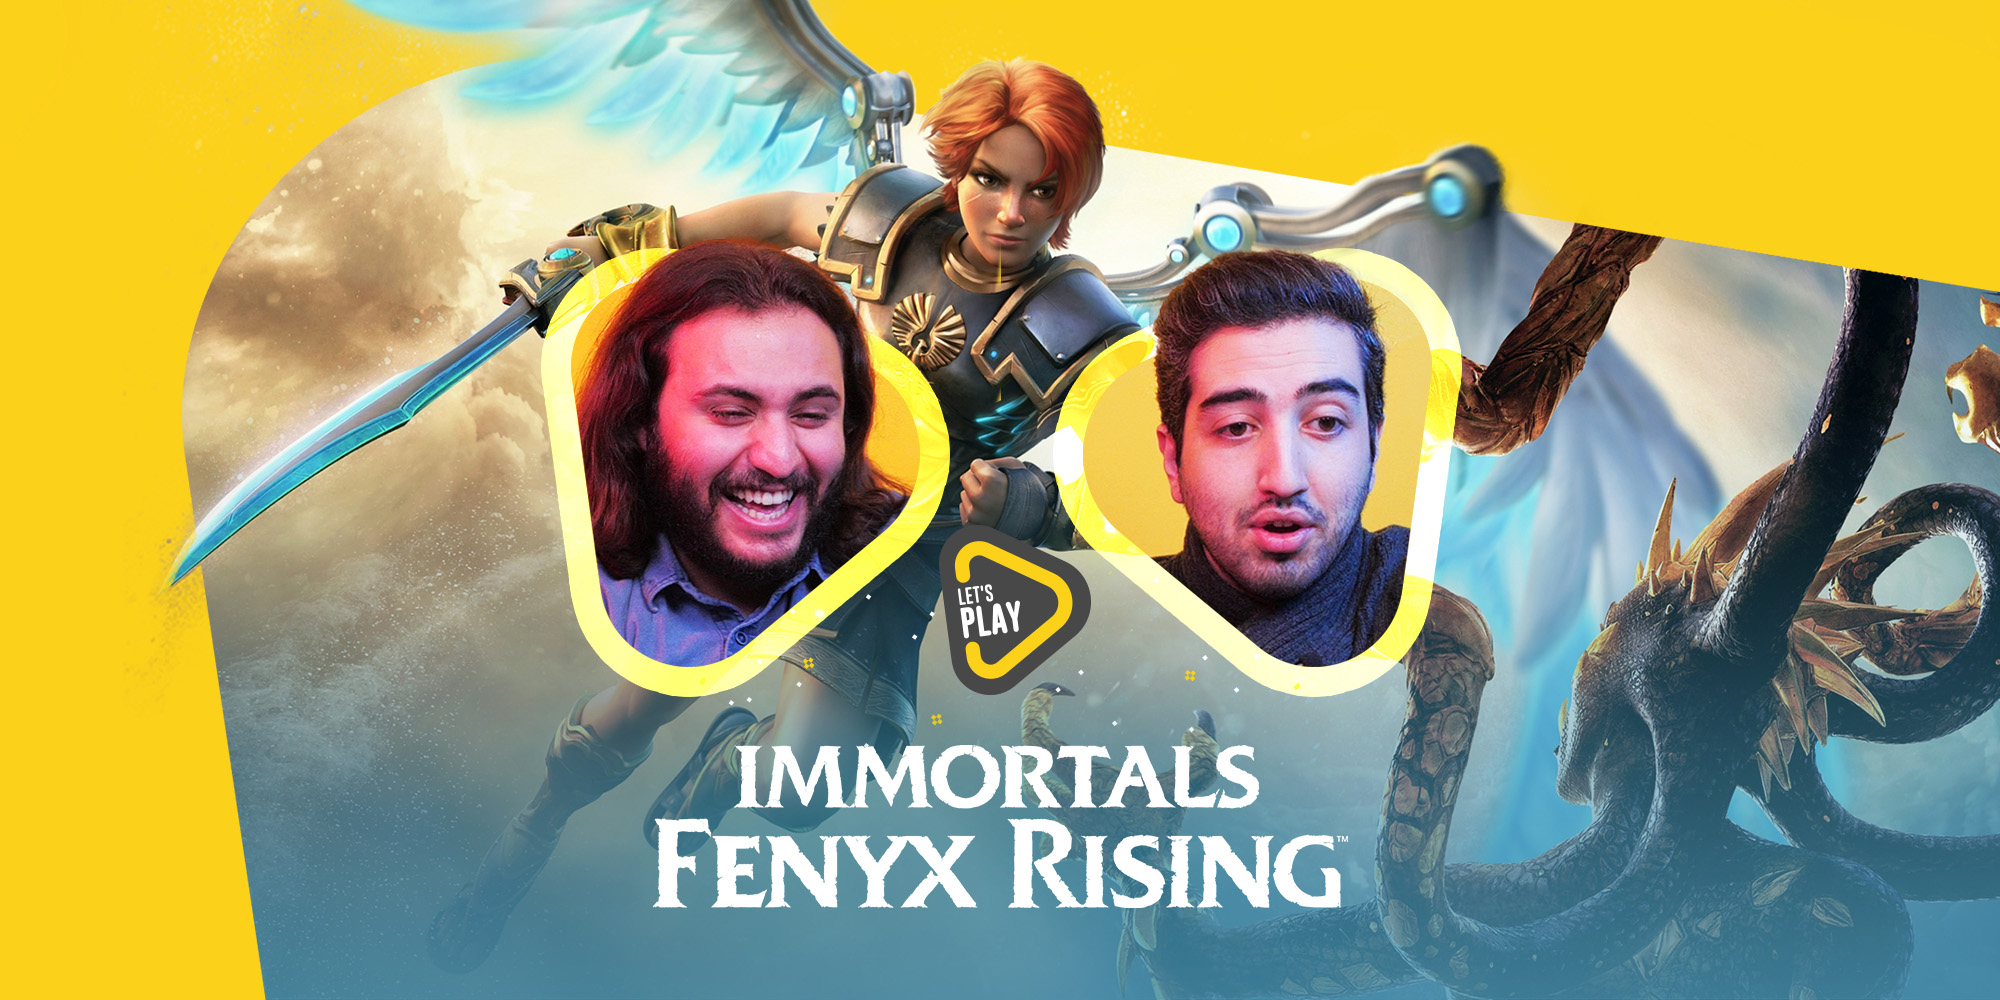 لتس پلی Immortals Fenyx Rising